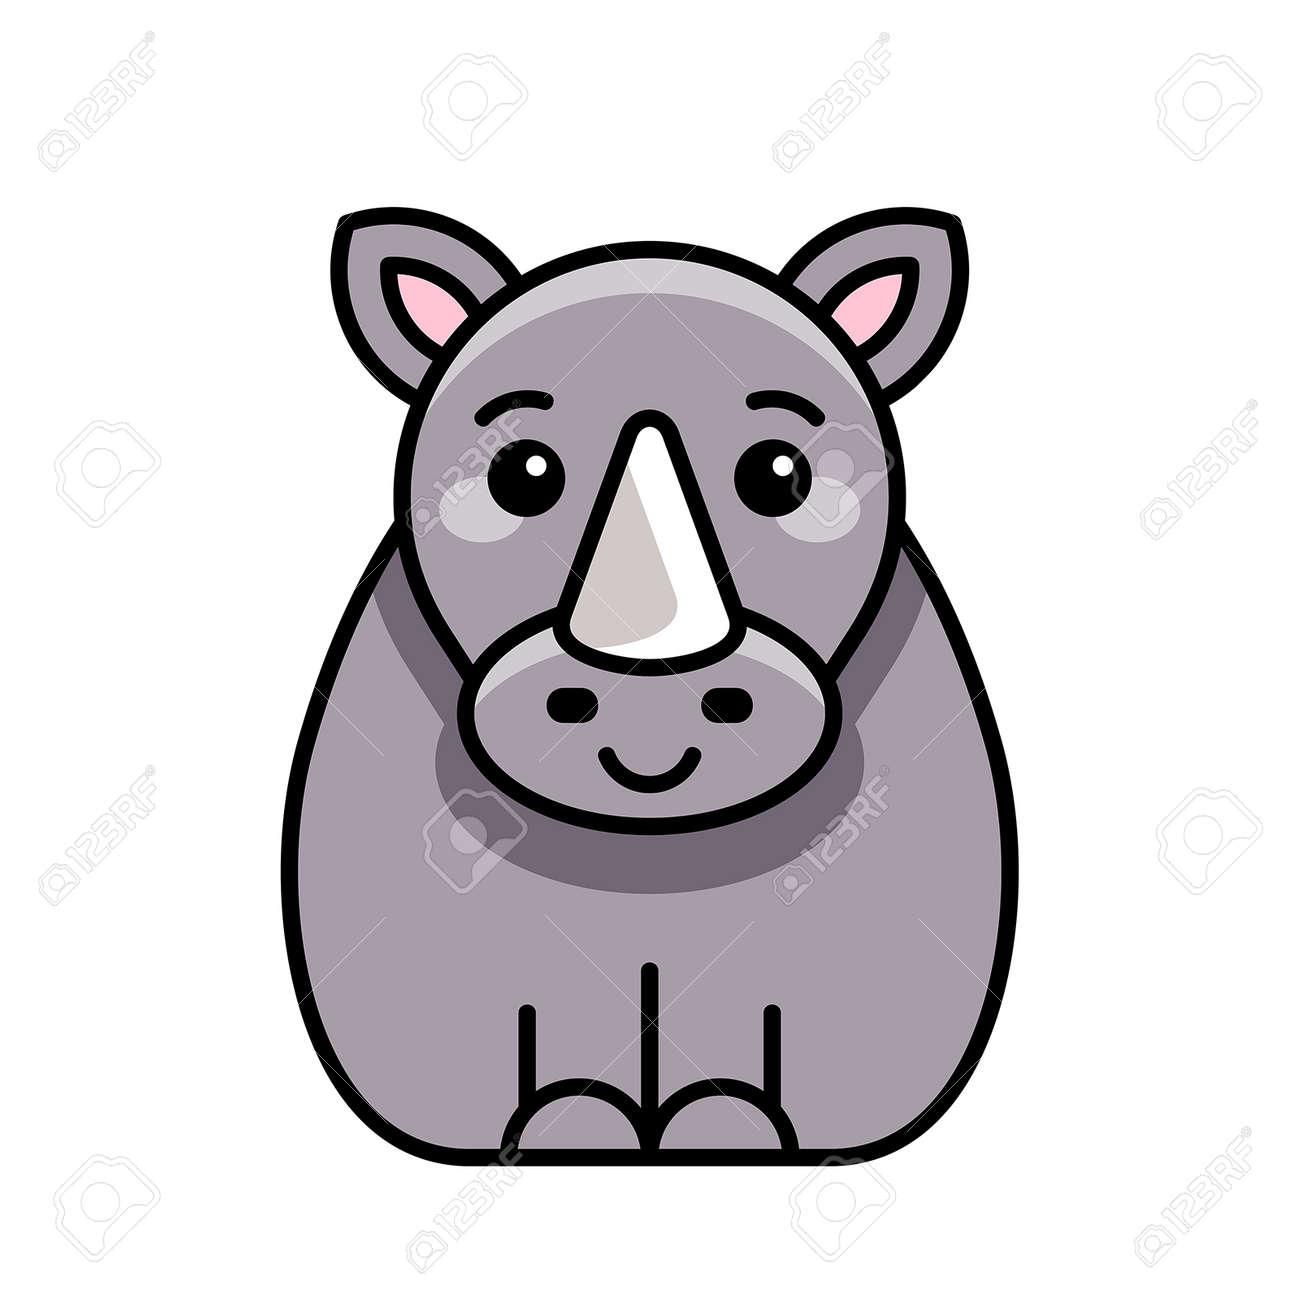 Rhinoceros icon. Icon design. Template elements - 171231644